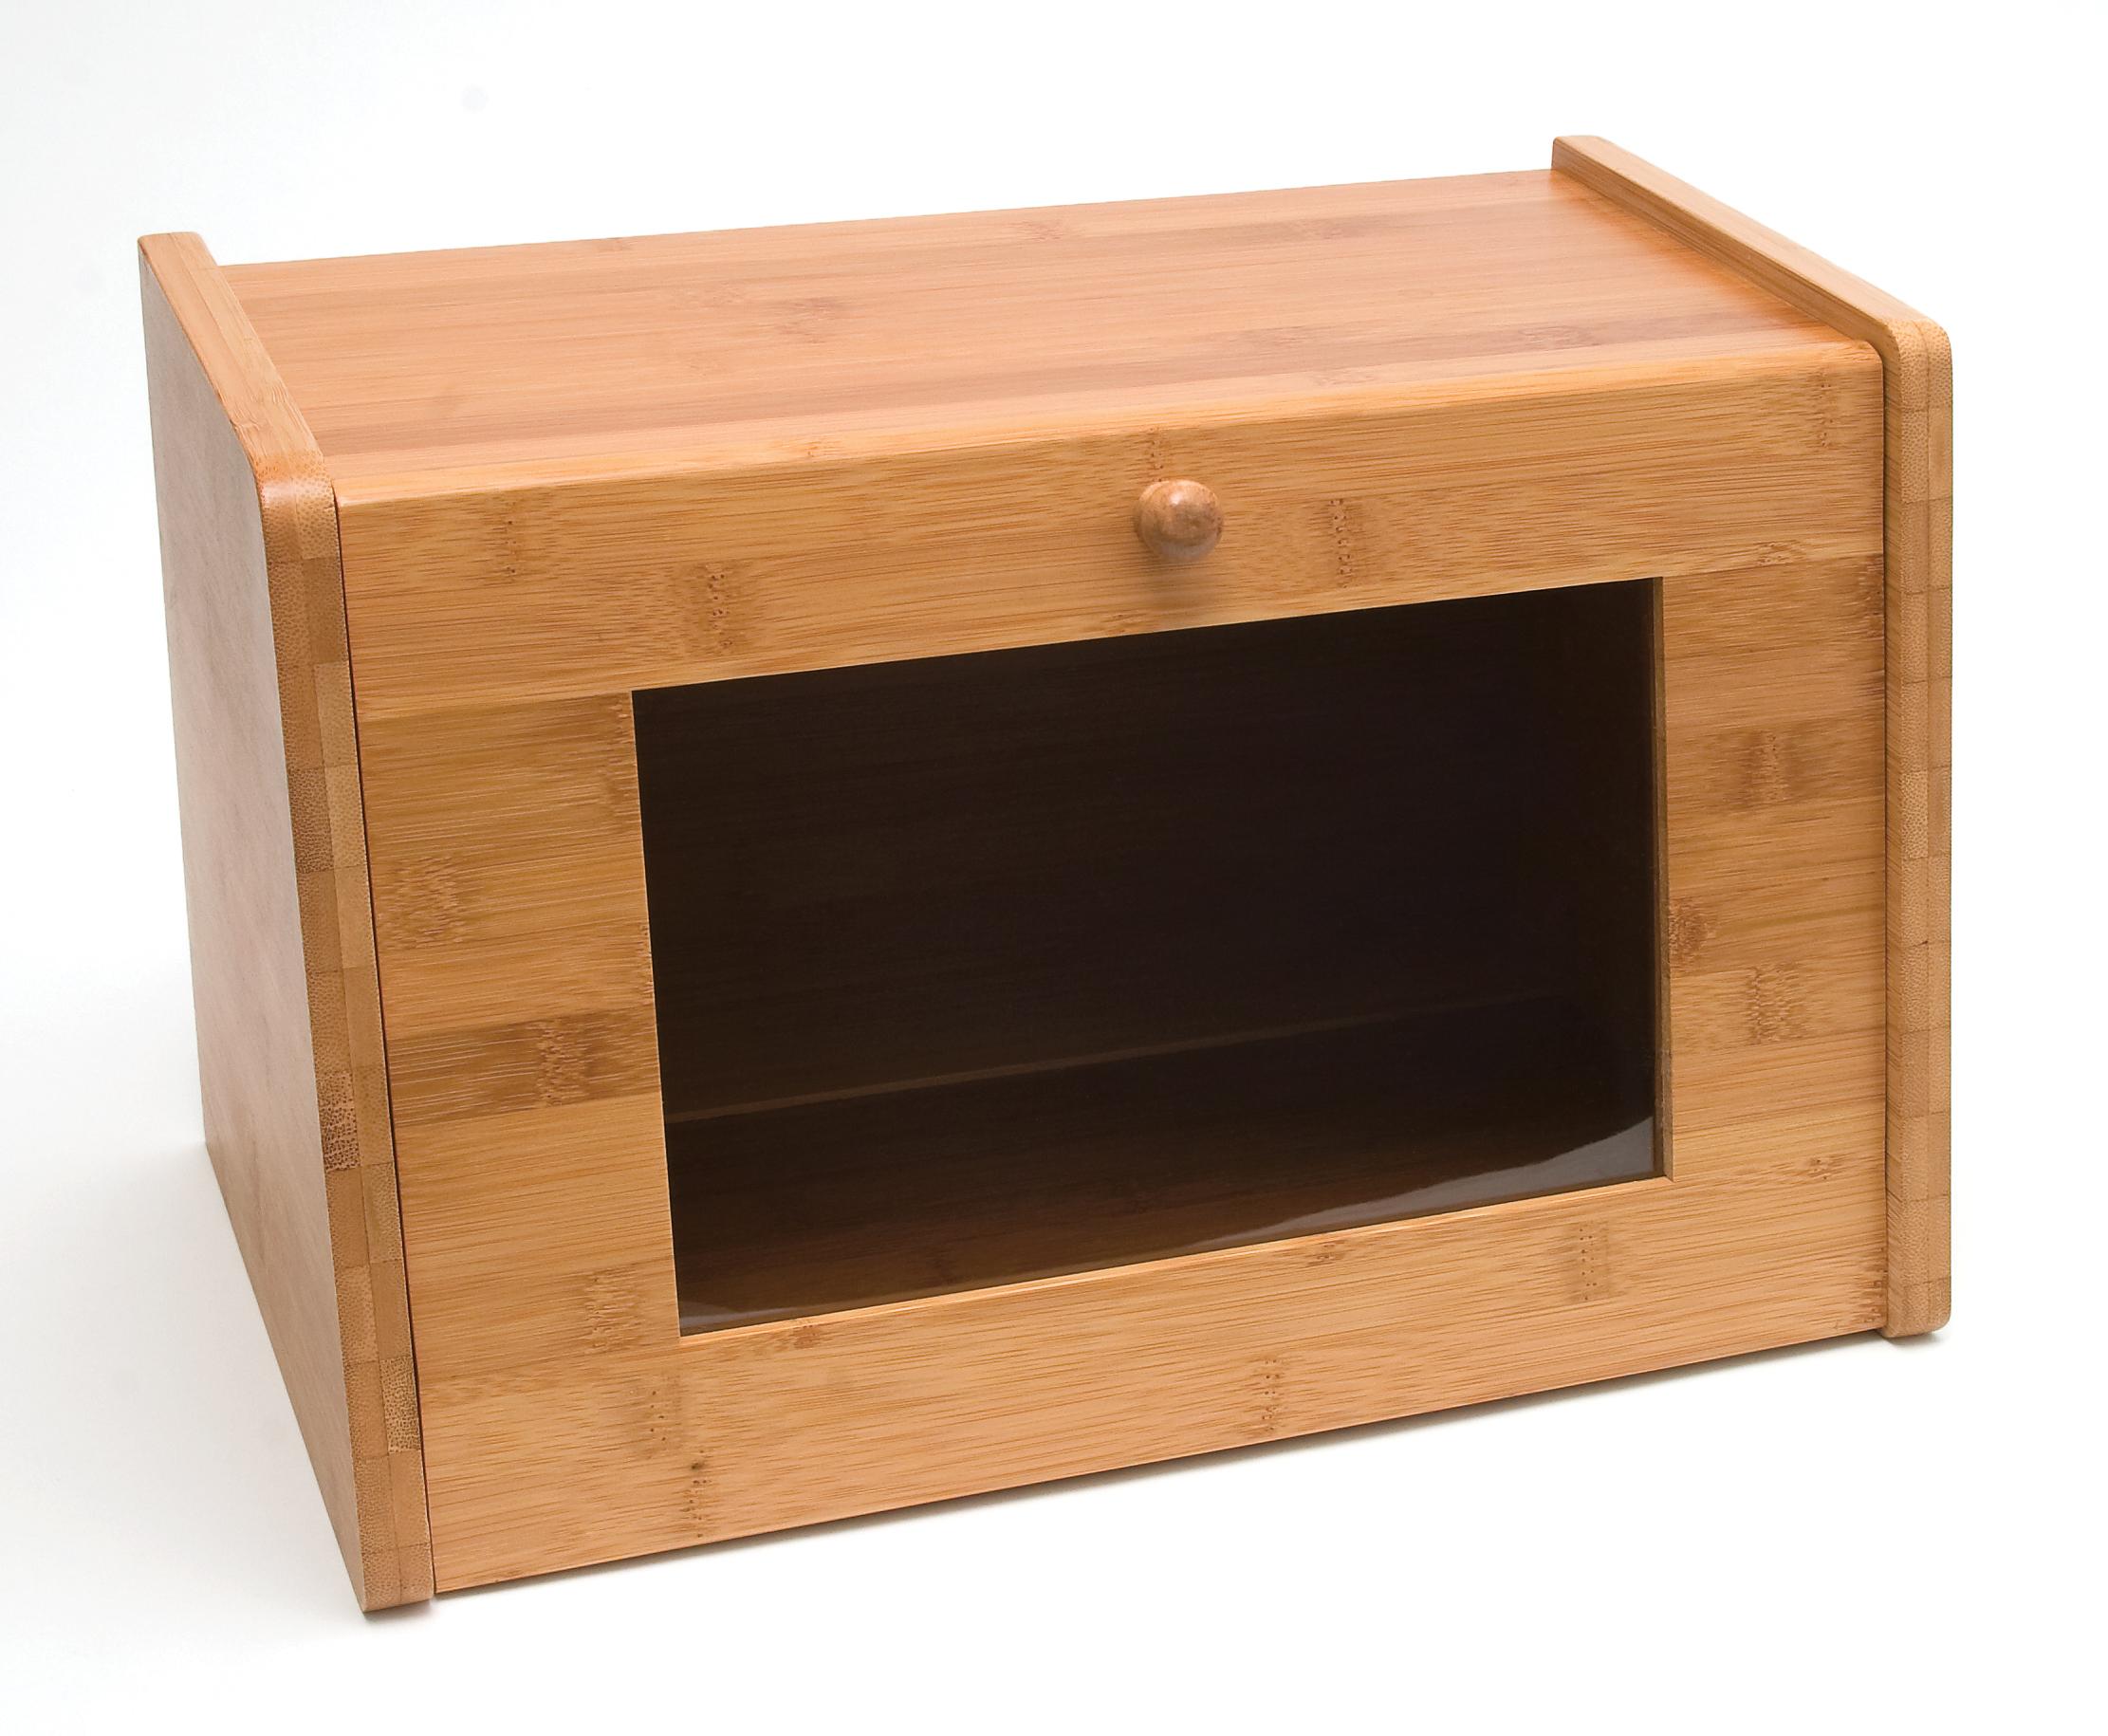 Bamboo Bread Box With Tempered Glass Window | Lipper International Tea U0026  Bread Boxes